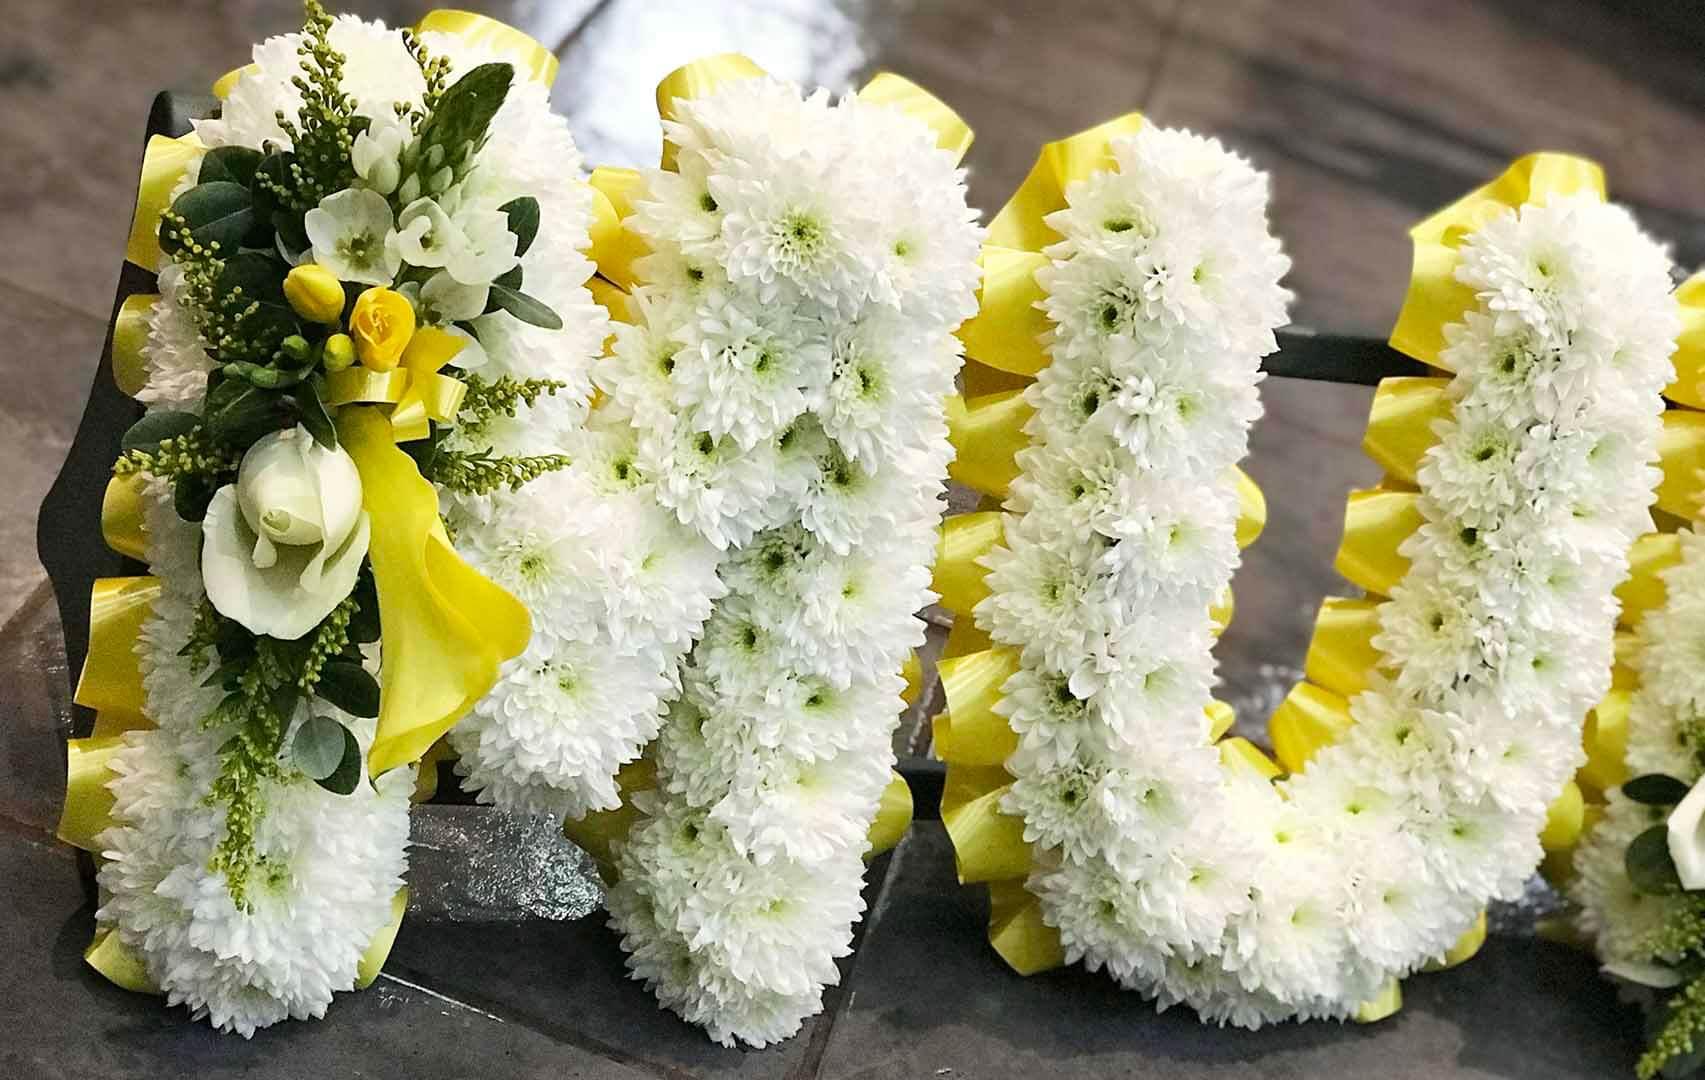 Funeral Flowers 15